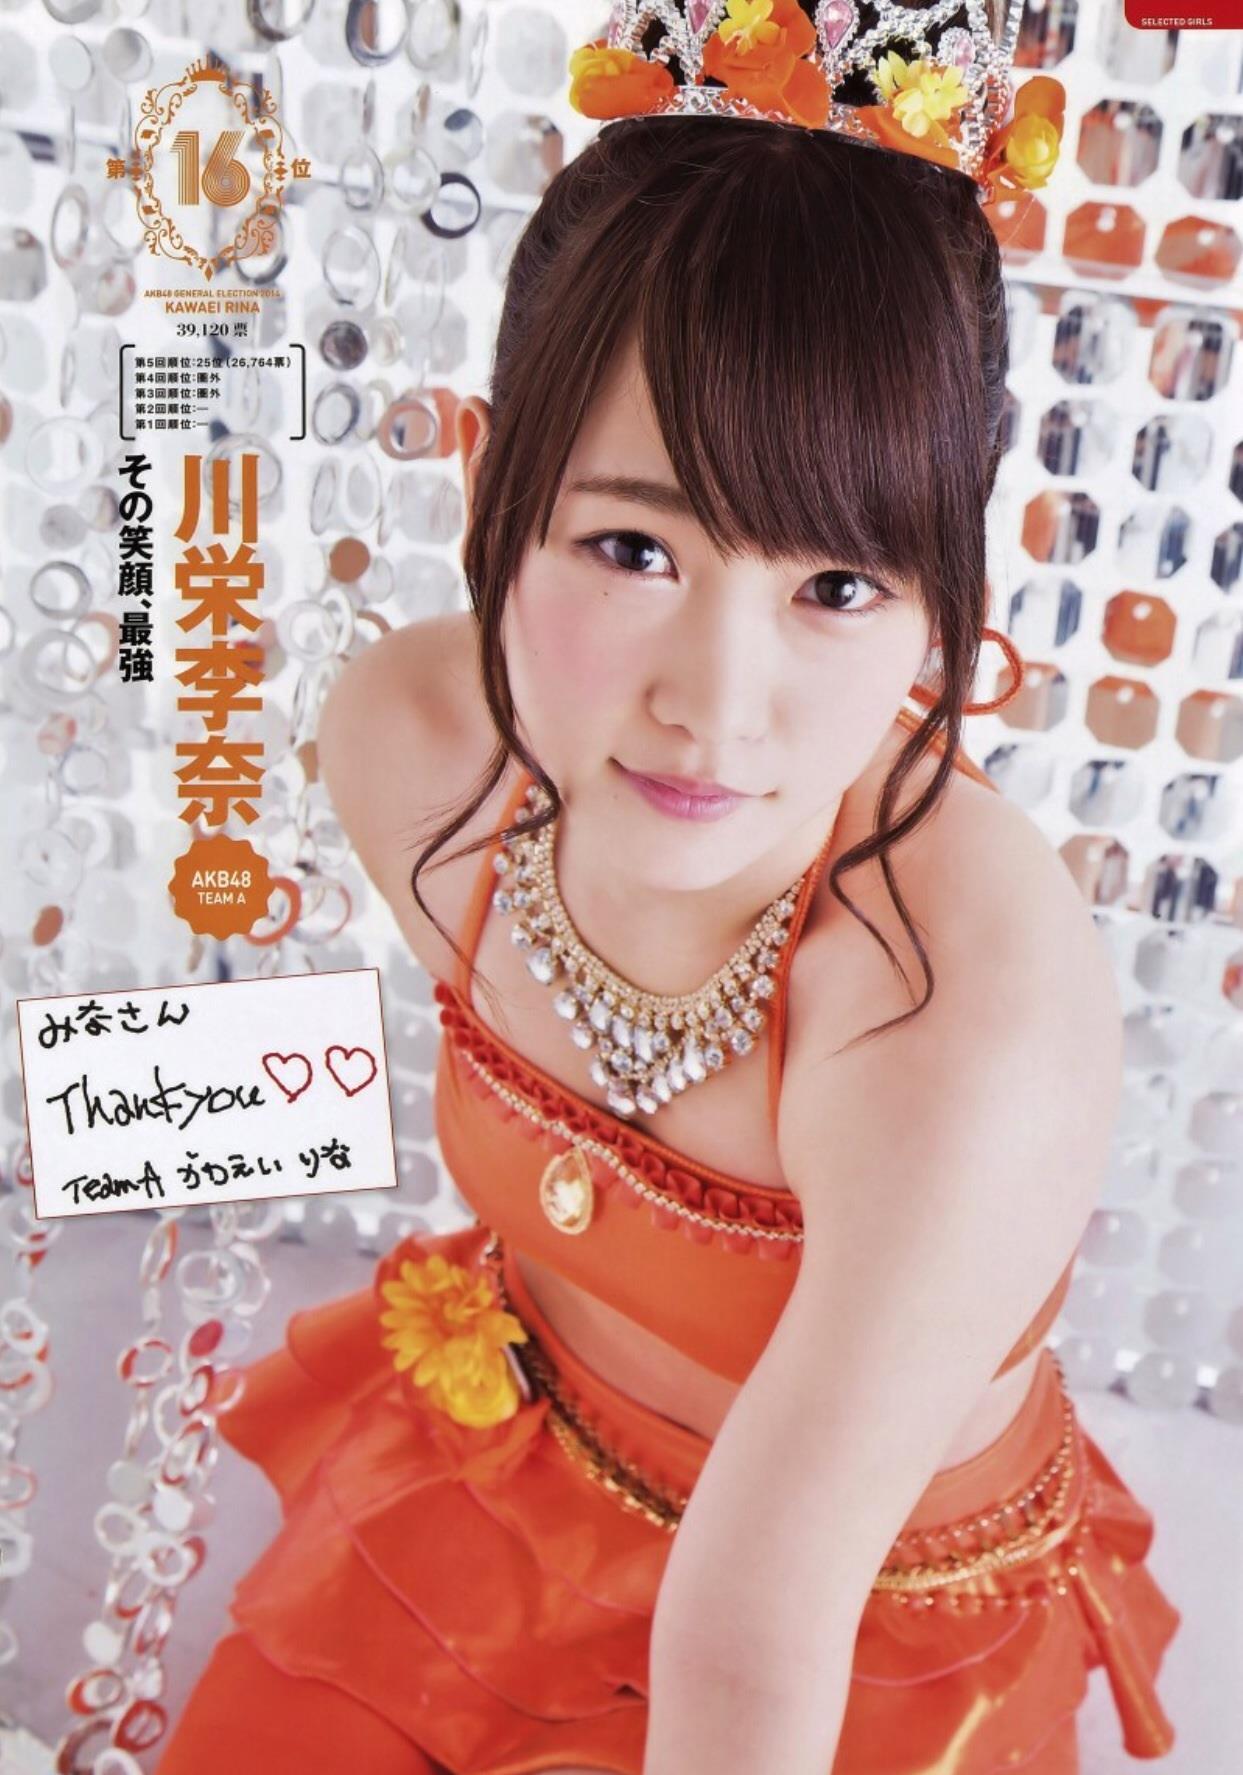 AKB48人気メンバー 画像 50